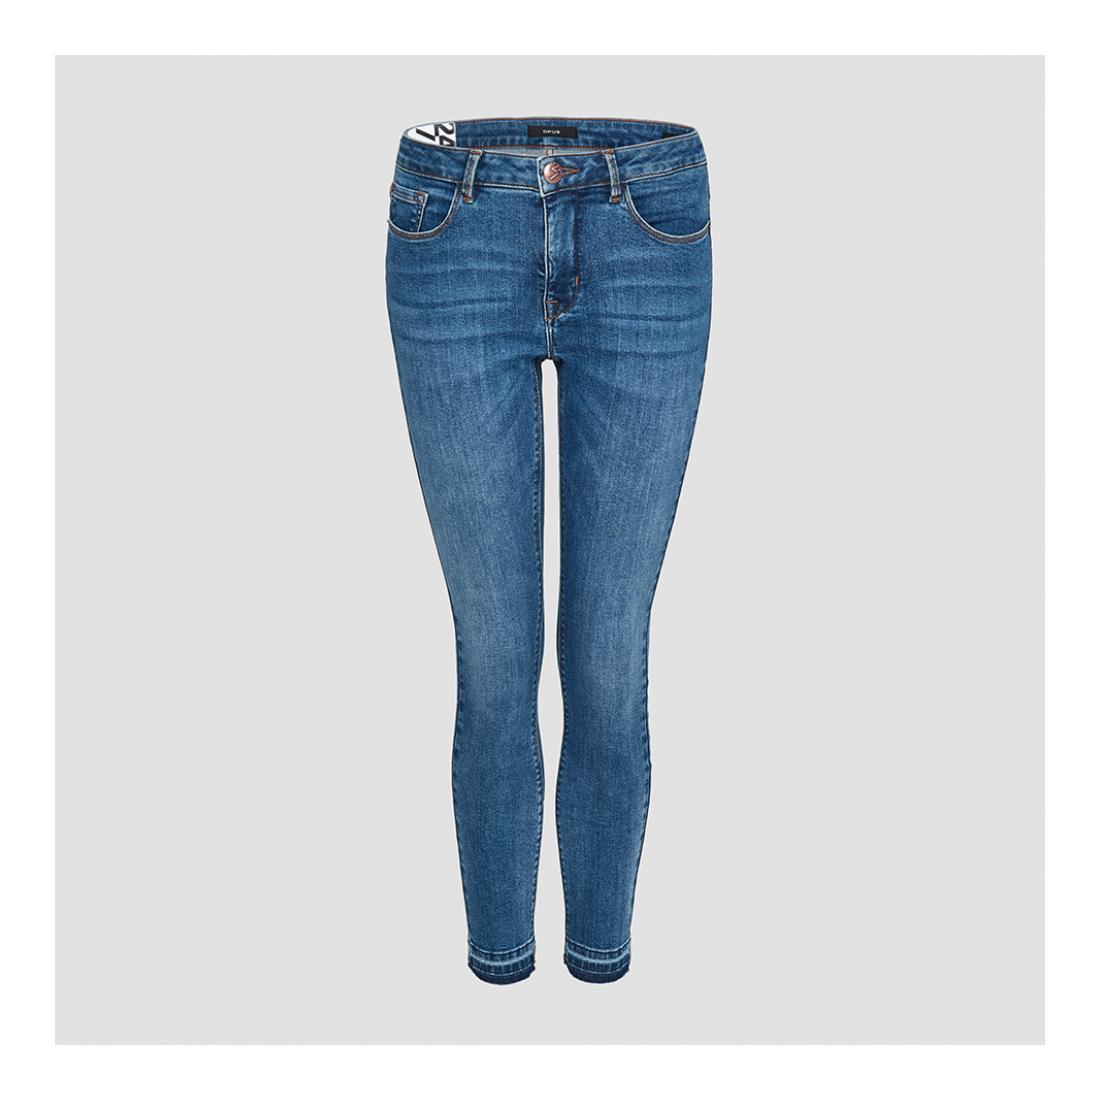 Opus Jeans Damen Elma tinted blue